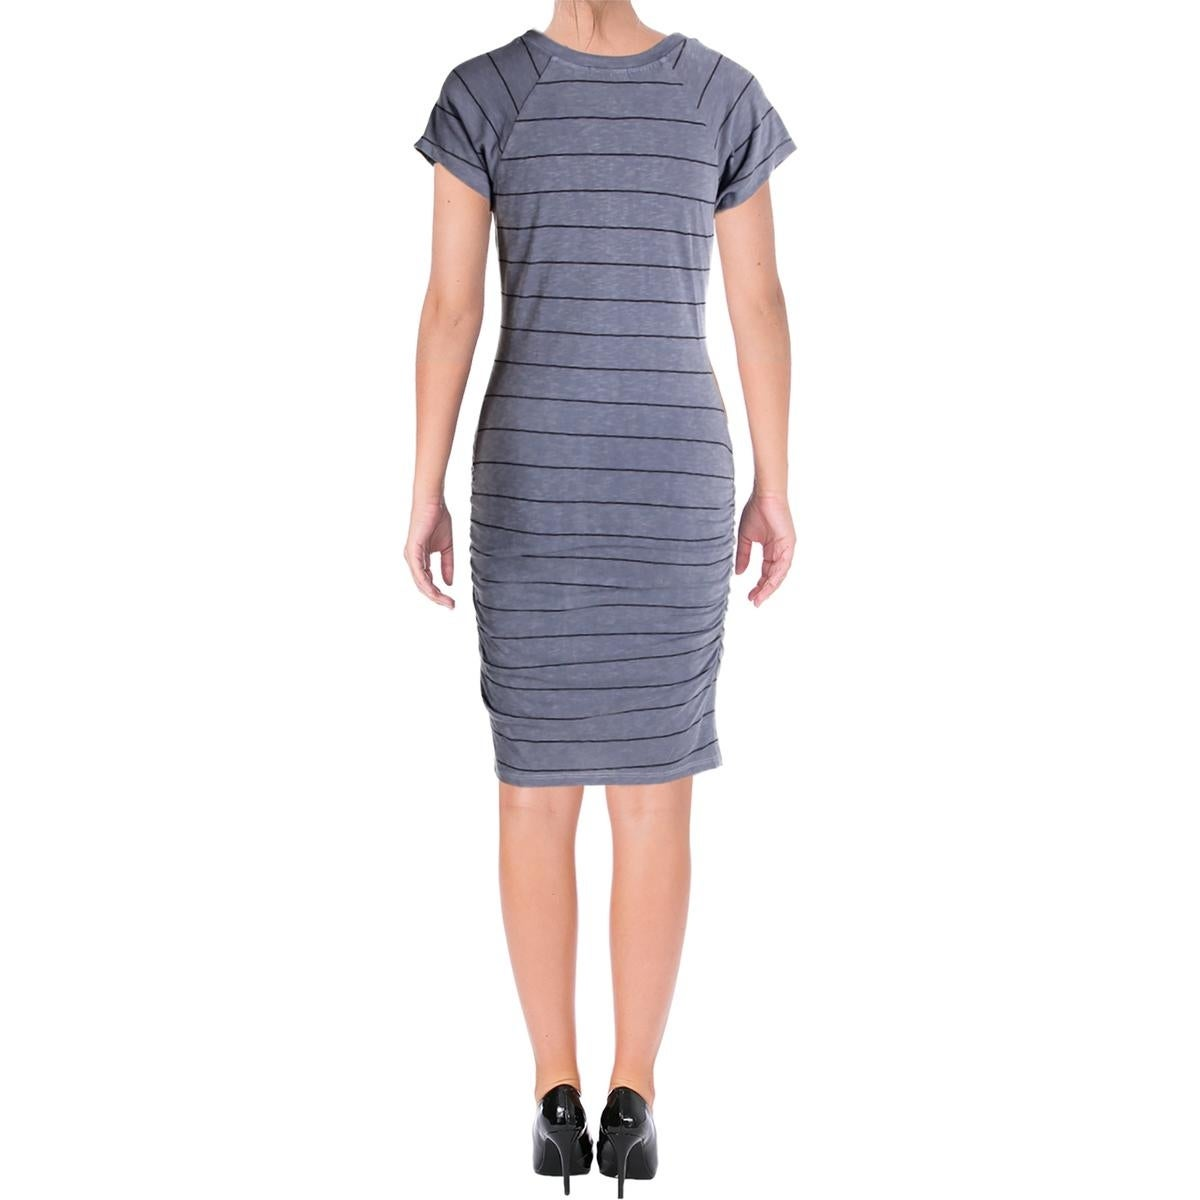 Shop Sundry Womens T Shirt Dress Casual Knee Length Free Shipping